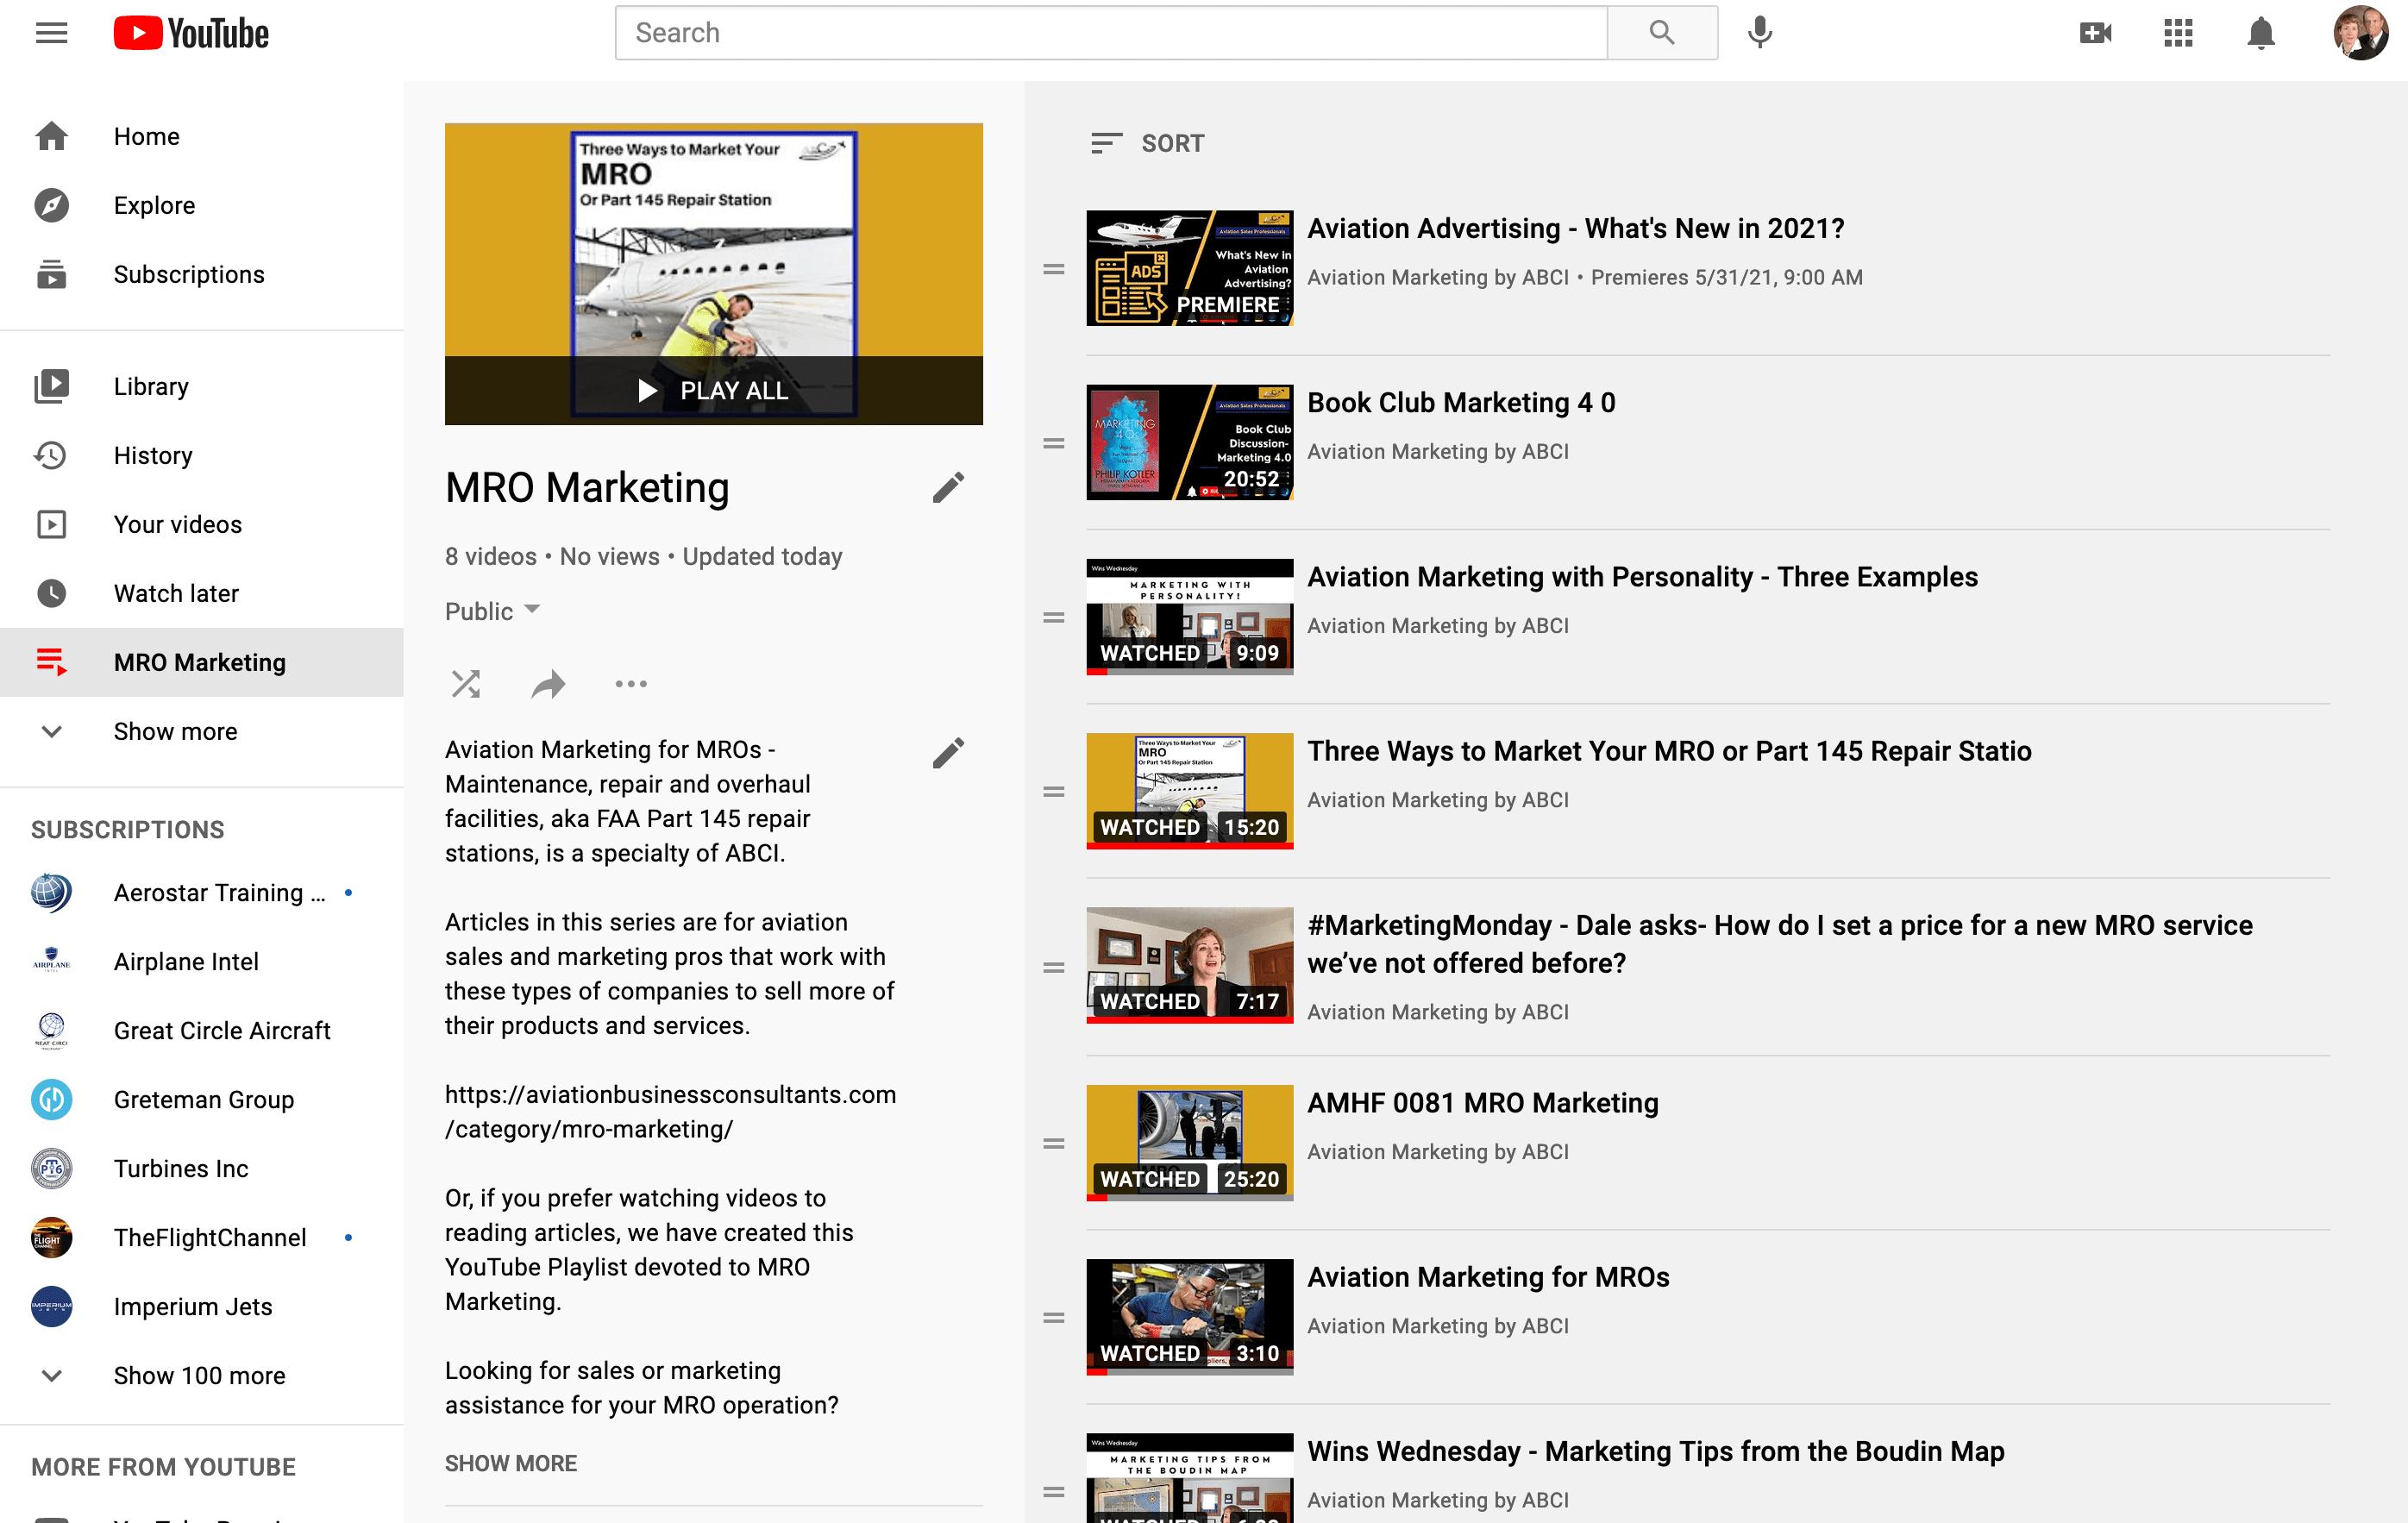 Aviation Marketing for MROs - the Youtube Playlist